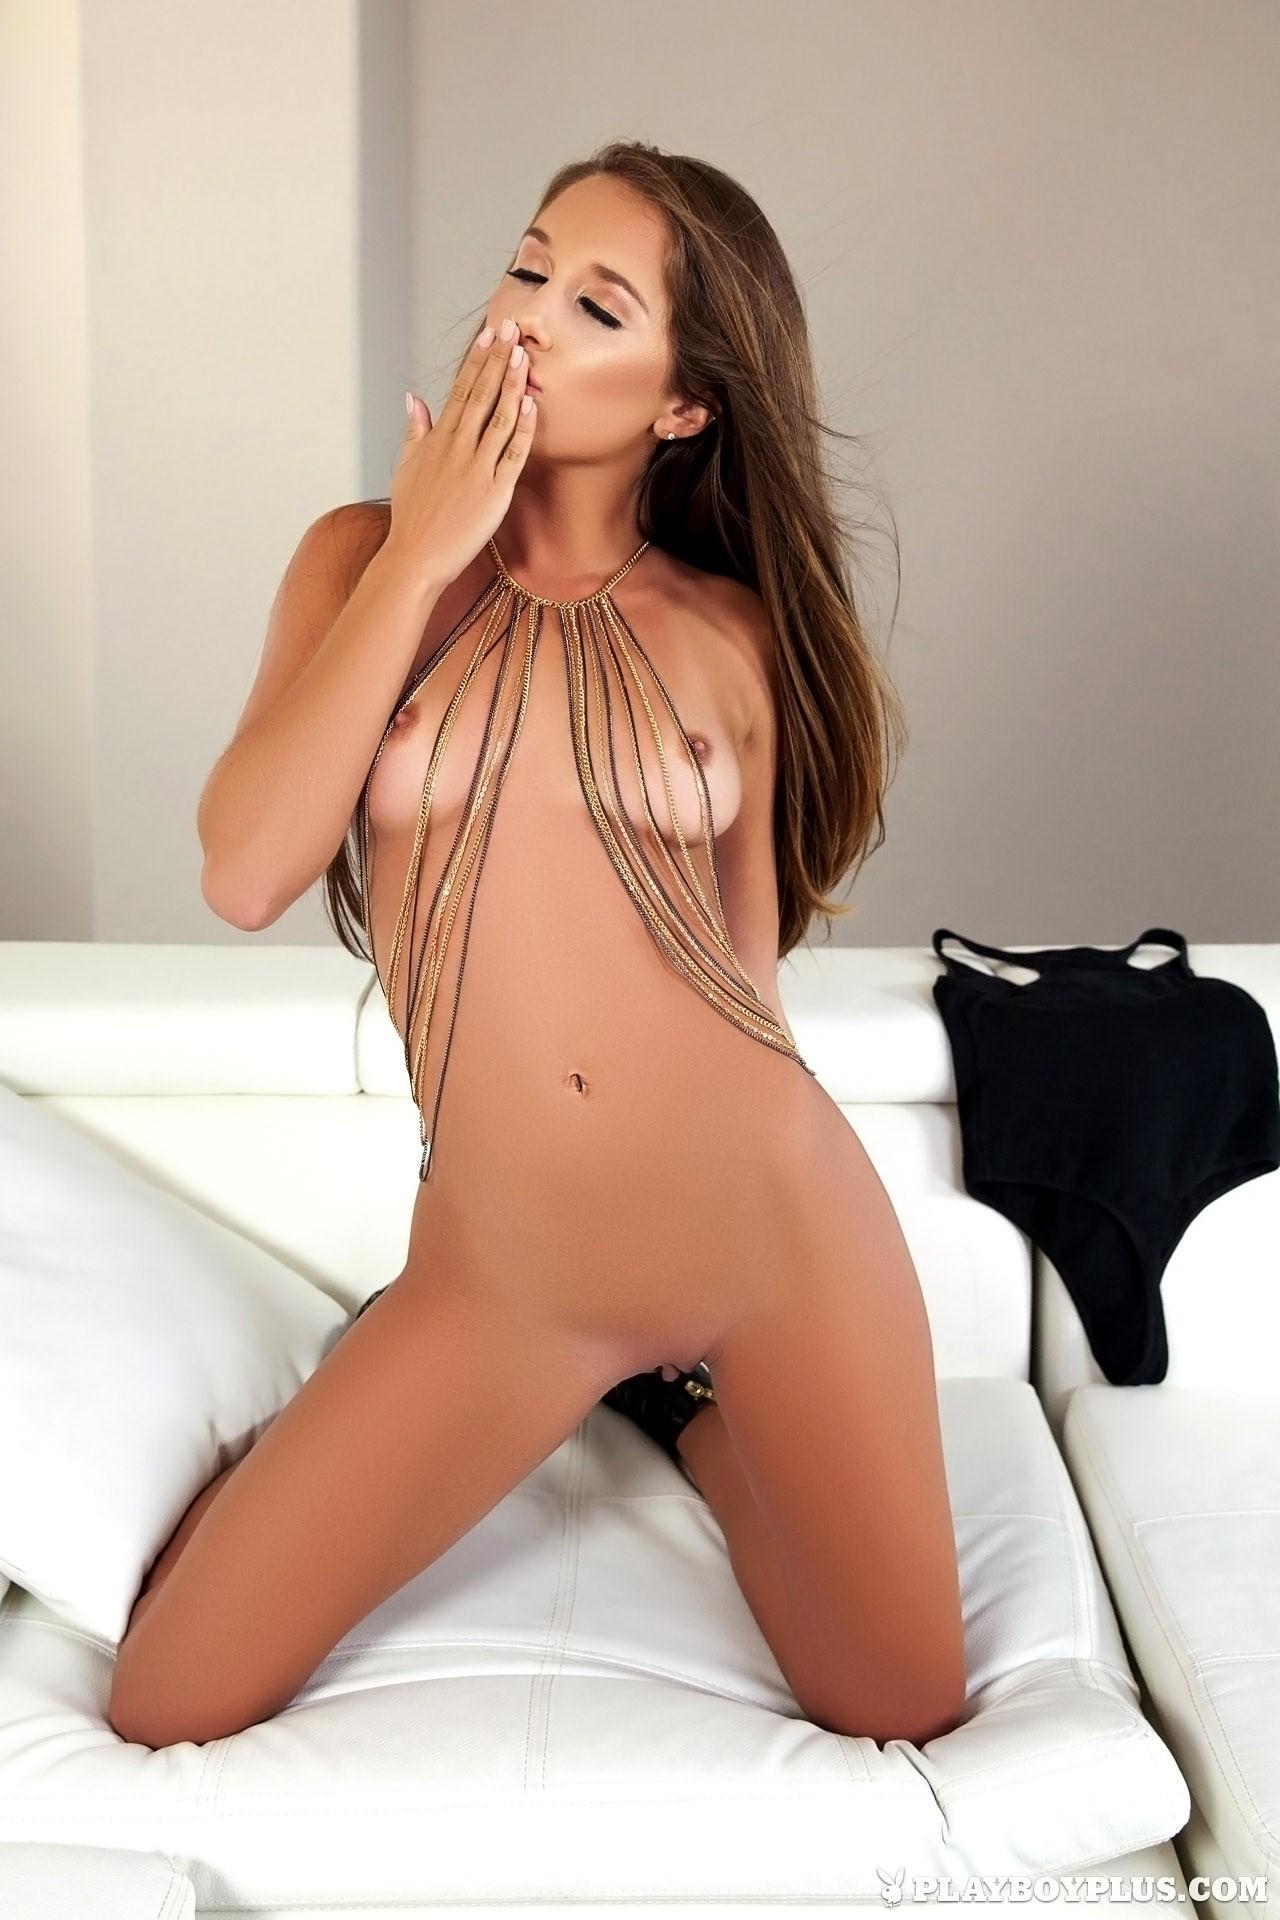 Girls shitting after anal fuck